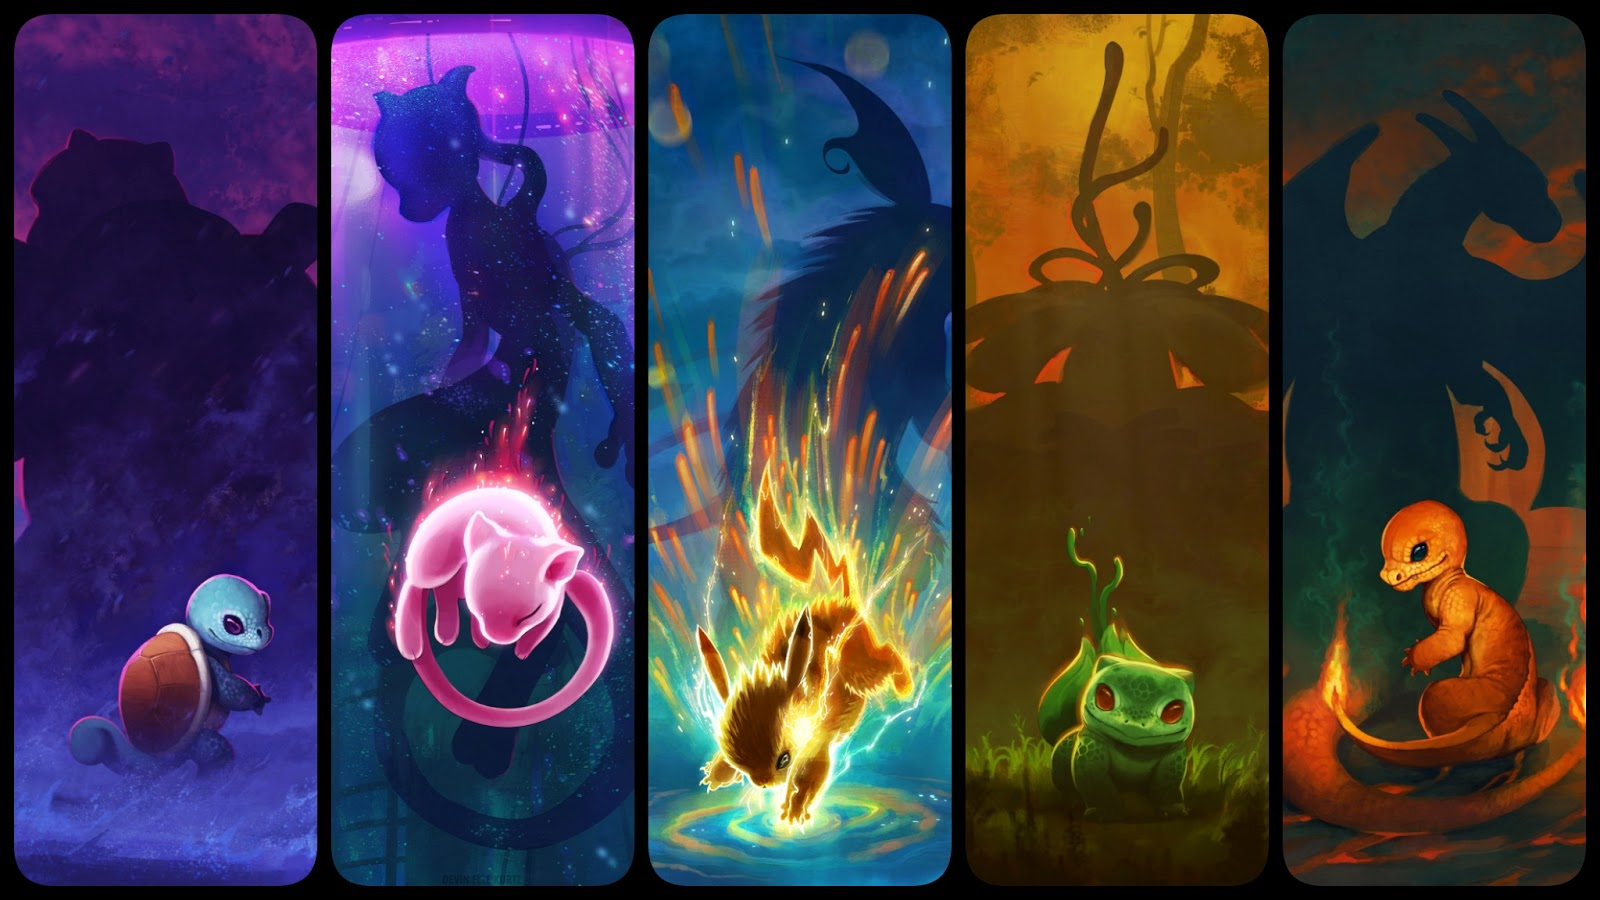 Thumbnail Pokémon phone wallpaper collection animes